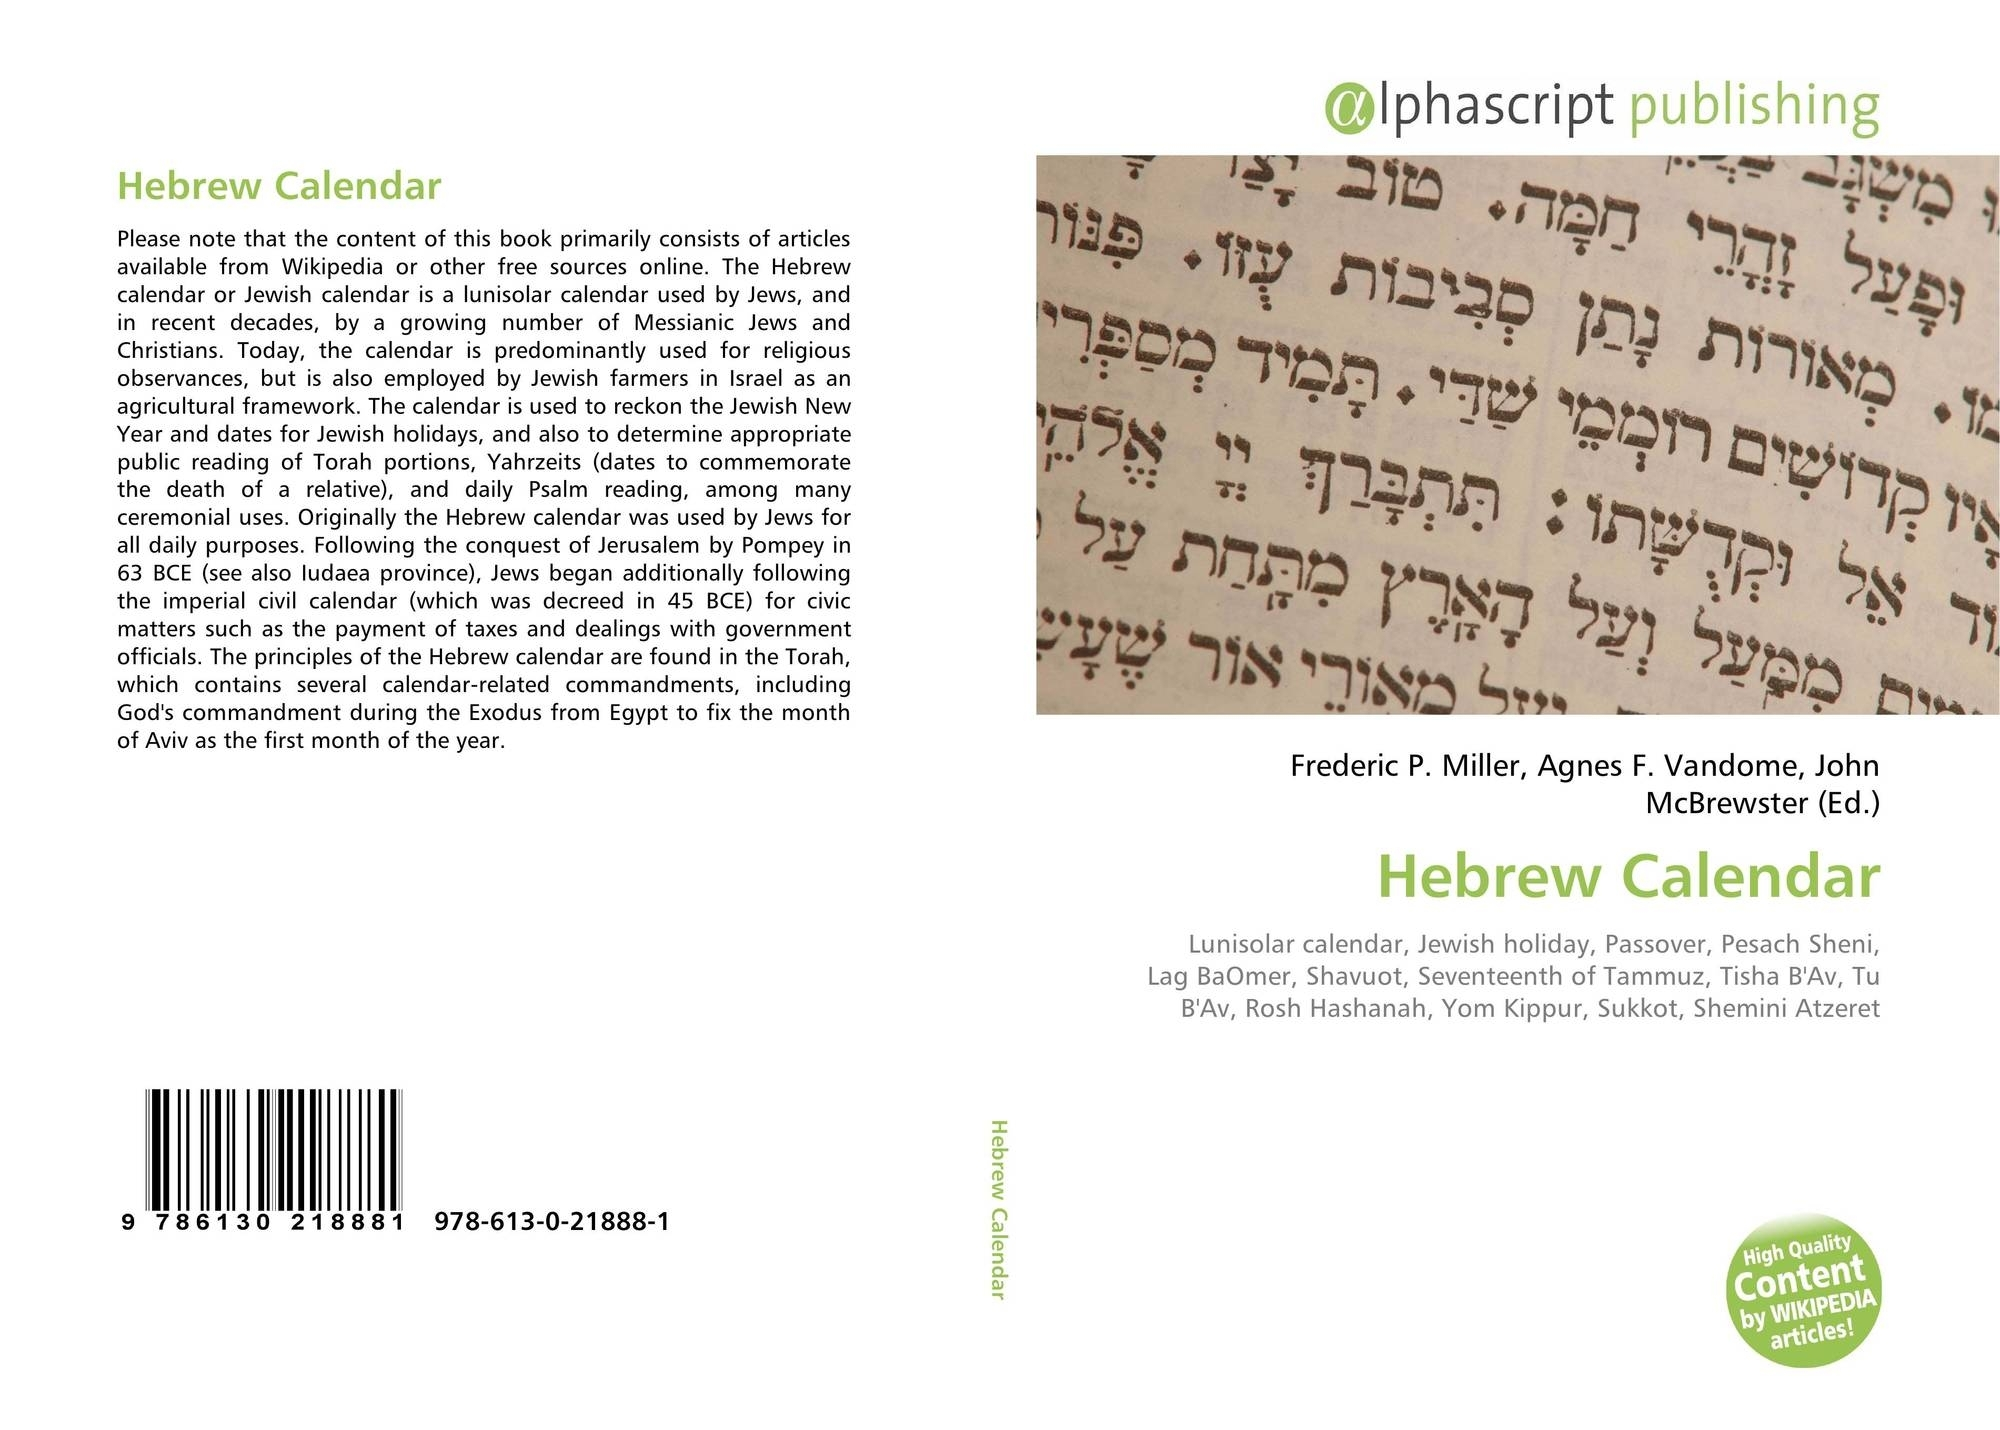 Hebrew Calendar, 978-613-0-21888-1, 6130218885 ,9786130218881